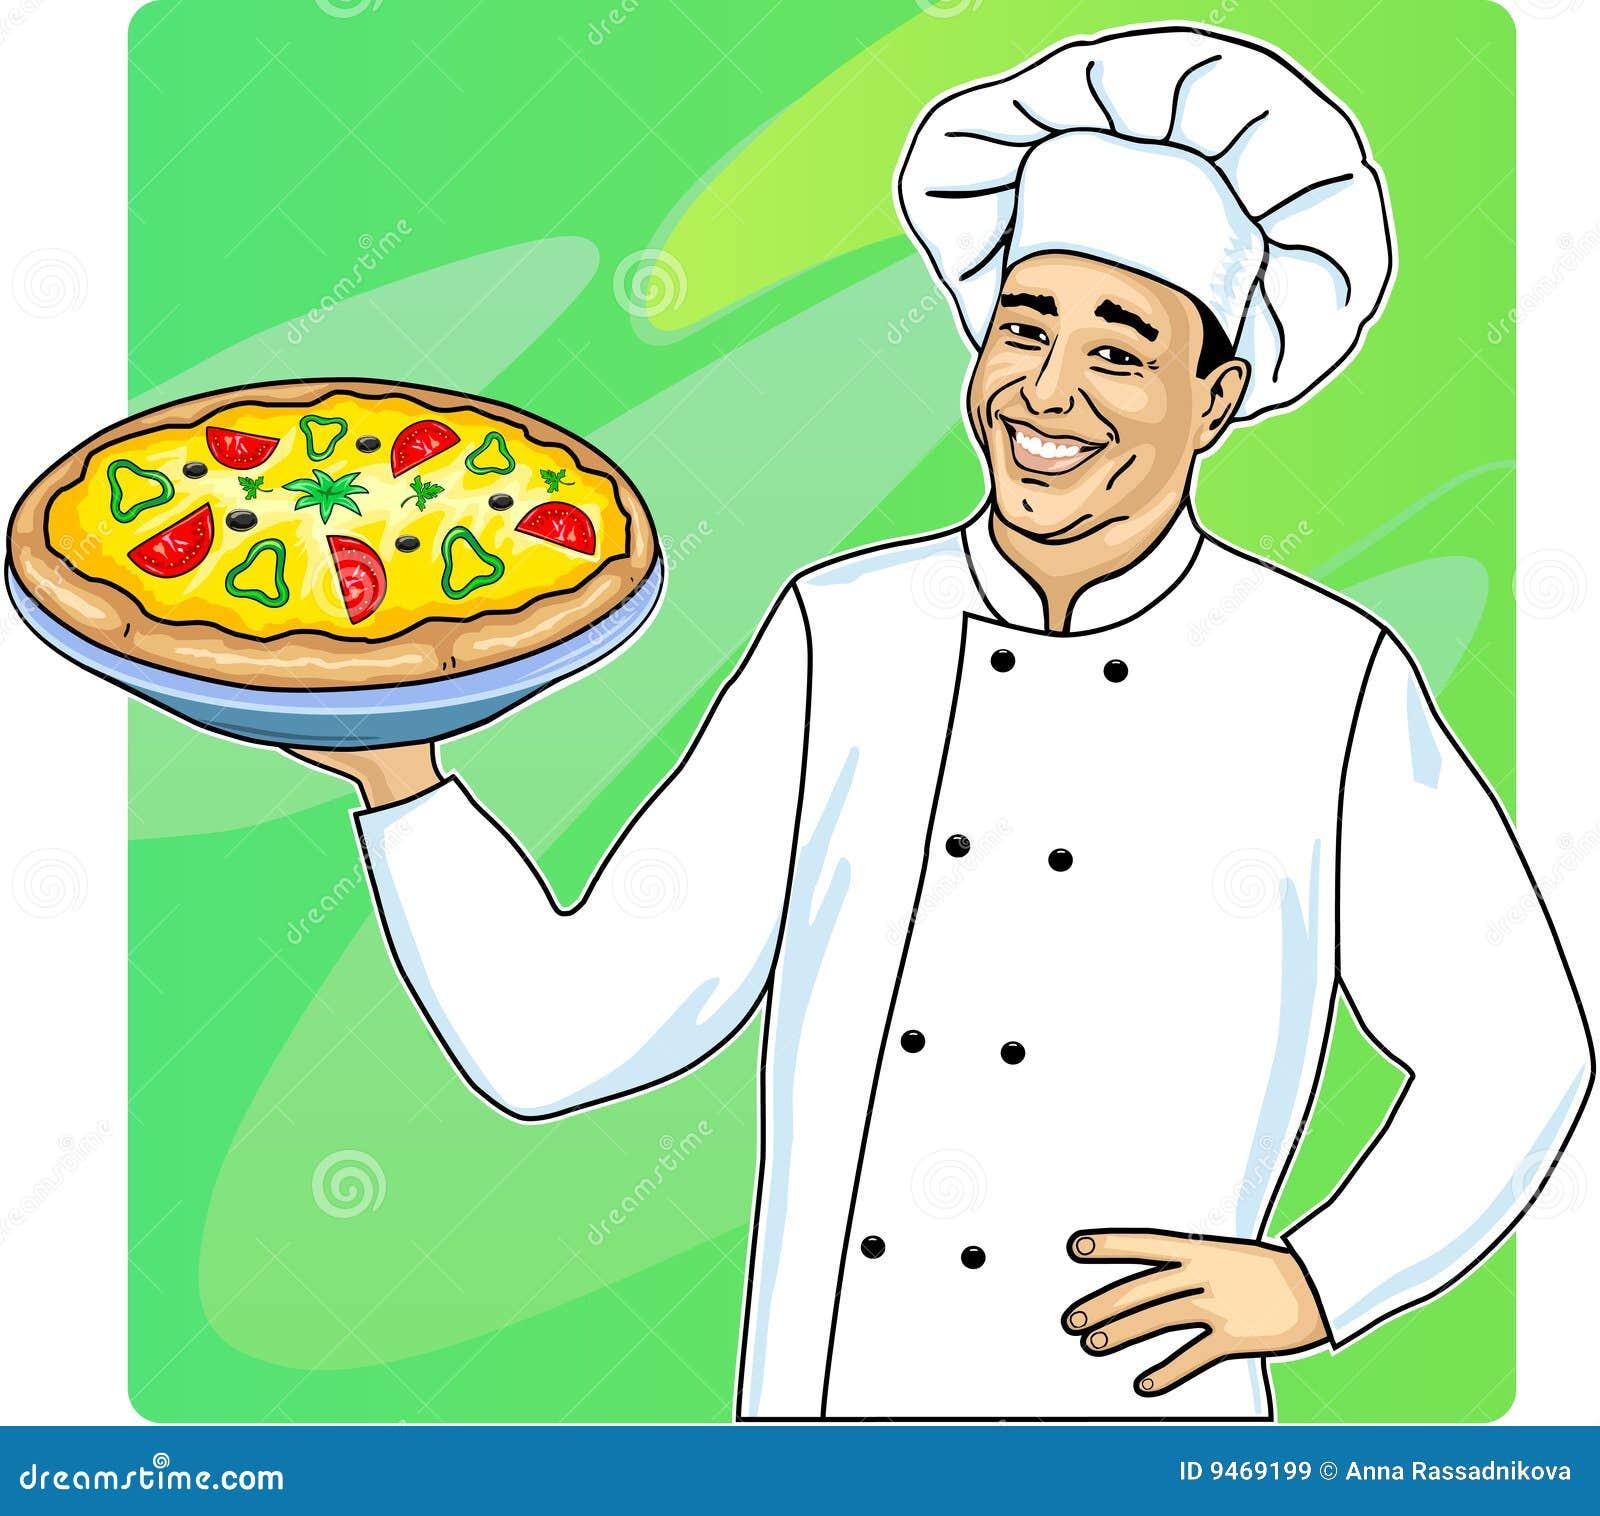 pizza man royalty free stock images image 9469199. Black Bedroom Furniture Sets. Home Design Ideas